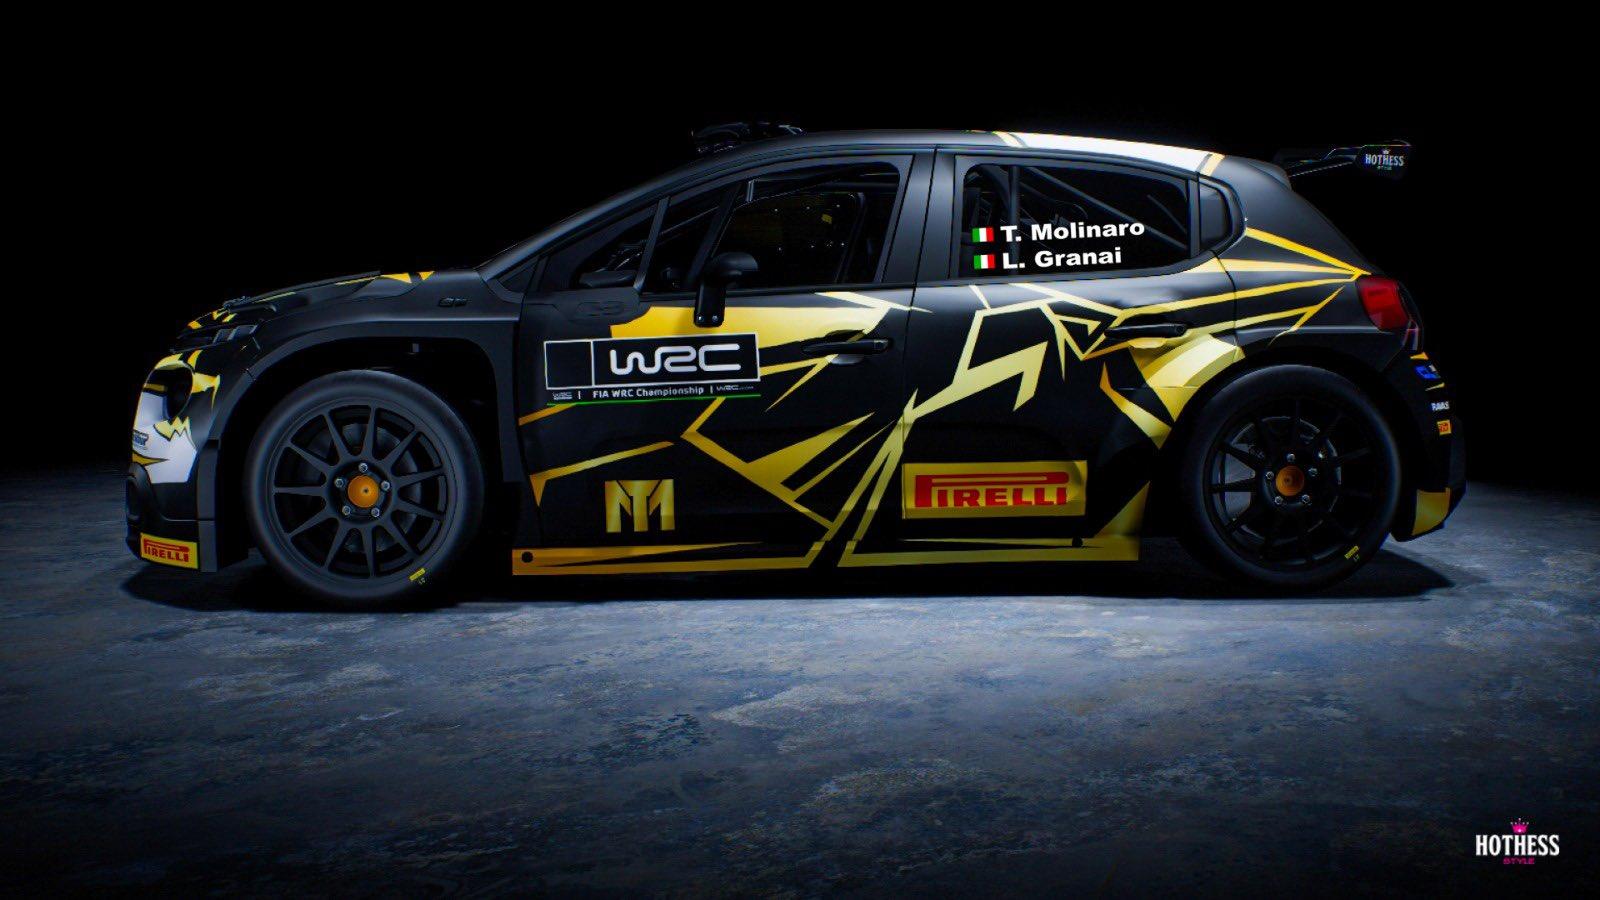 World Rally Championship: Temporada 2019 - Página 10 DyGd8rpX0AAPrj9